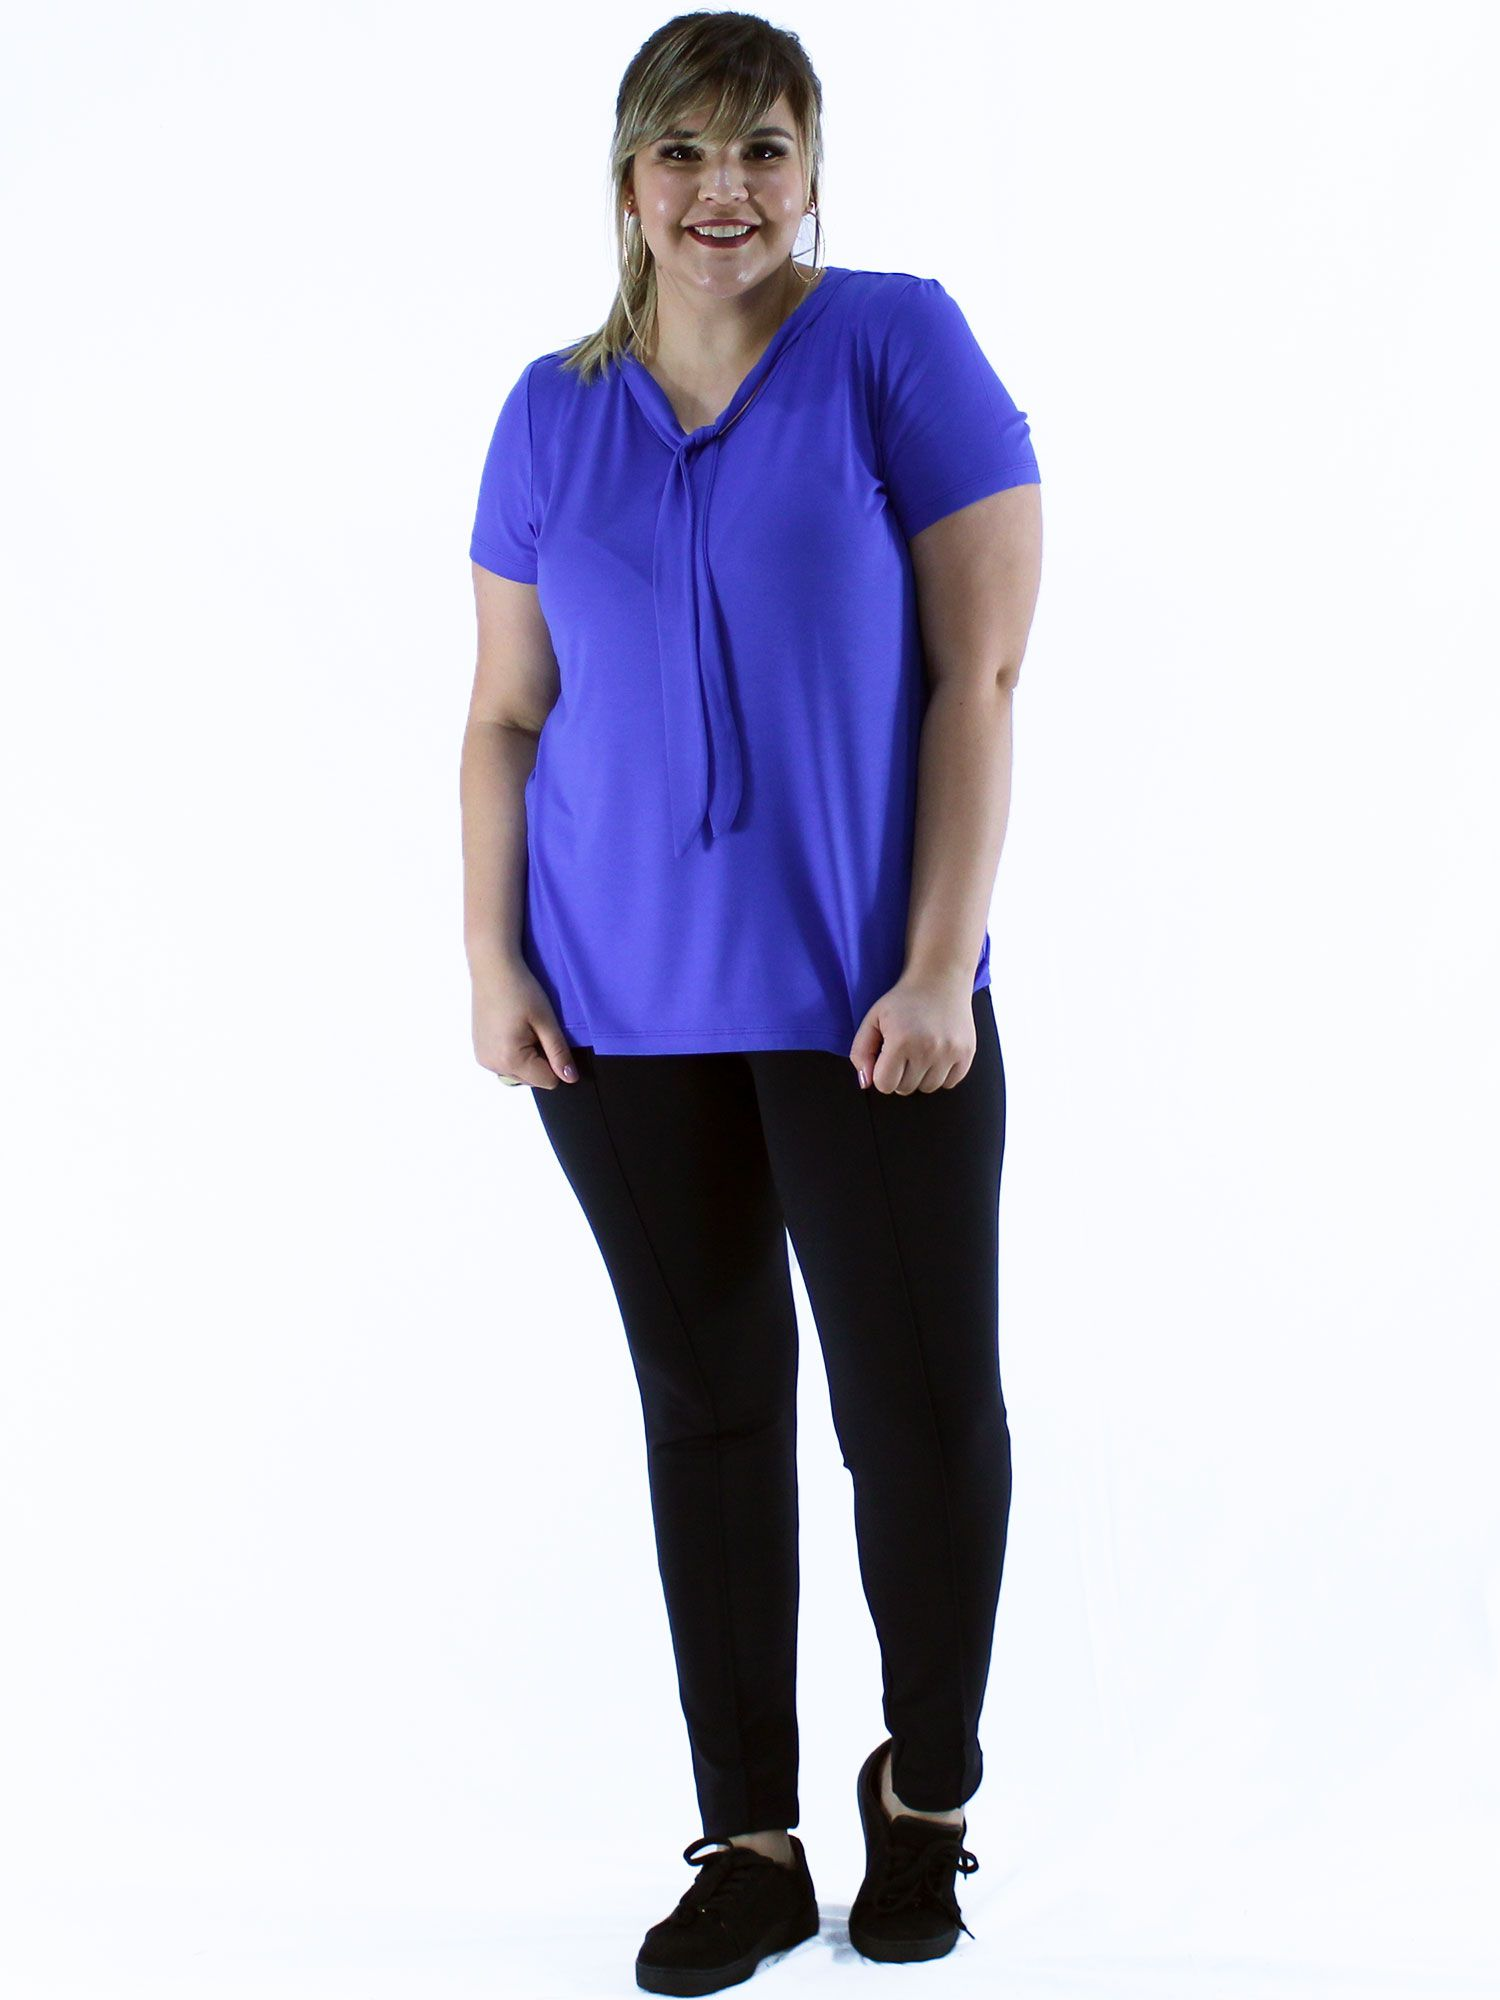 Blusa Plus Size KTS Decote Laço Bic